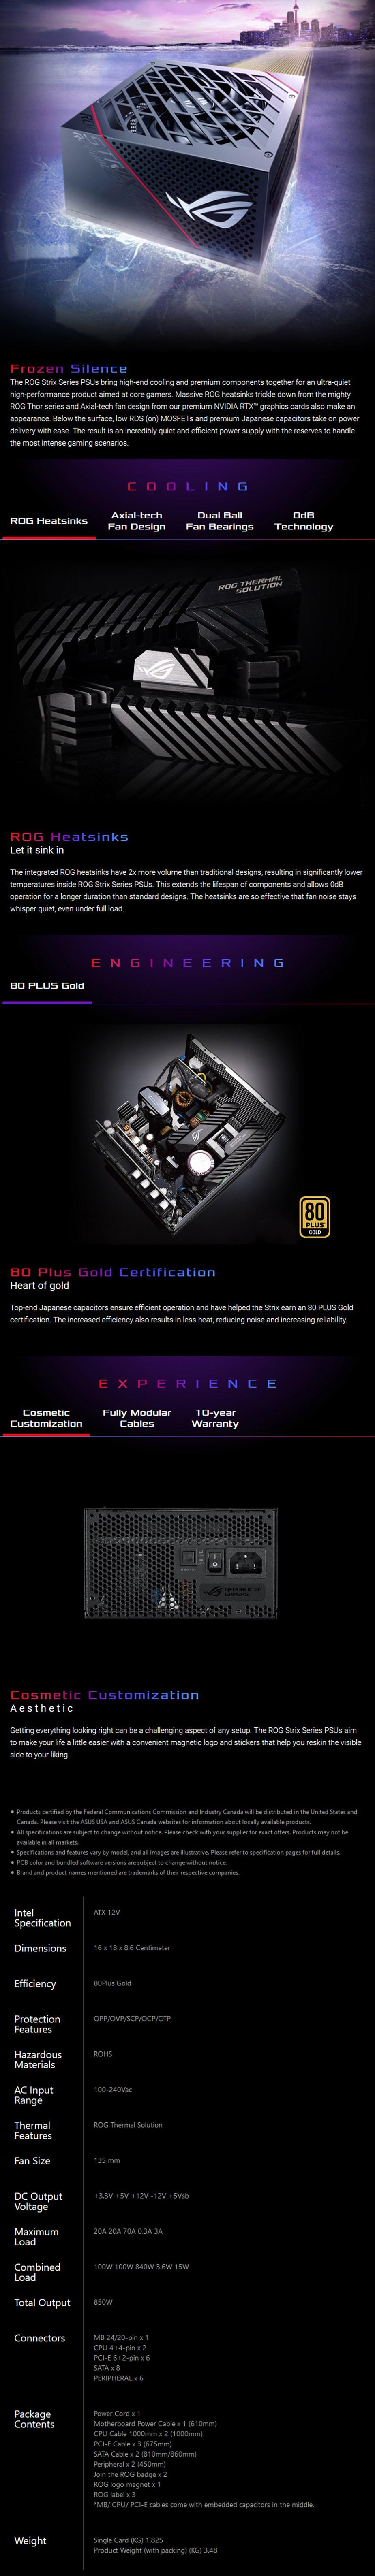 asus-rog-strix-850w-80-gold-fully-maaodular-power-supply-ac35972-6.jpg